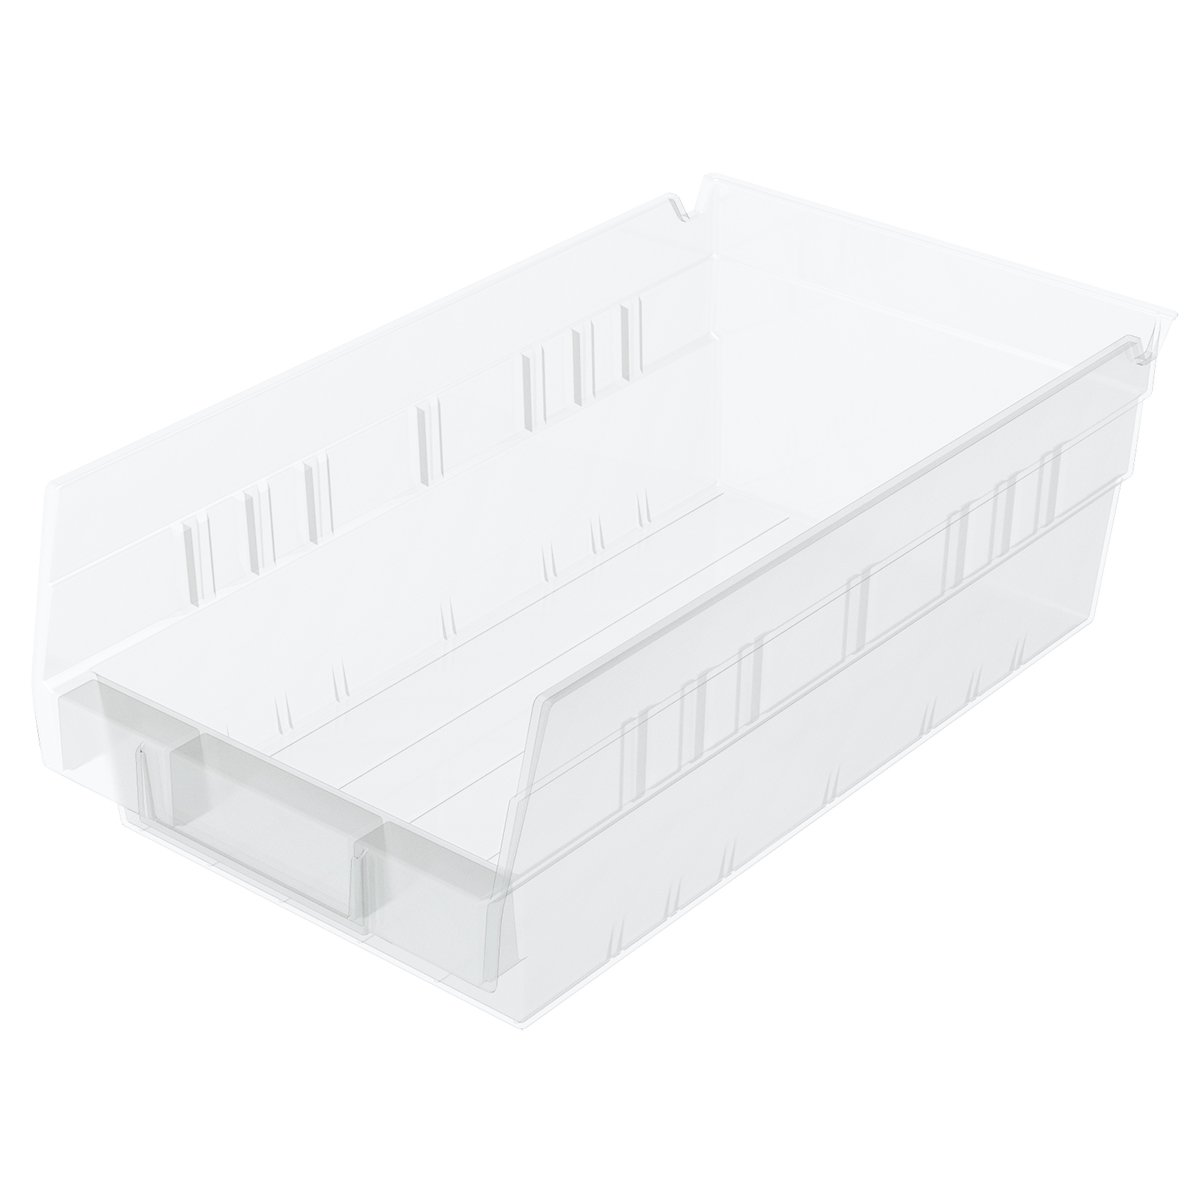 Akro-Mils 30130 12-Inch by 6-Inch by 4-Inch Clear Plastic Nesting Shelf Bin Box, 12-Pack